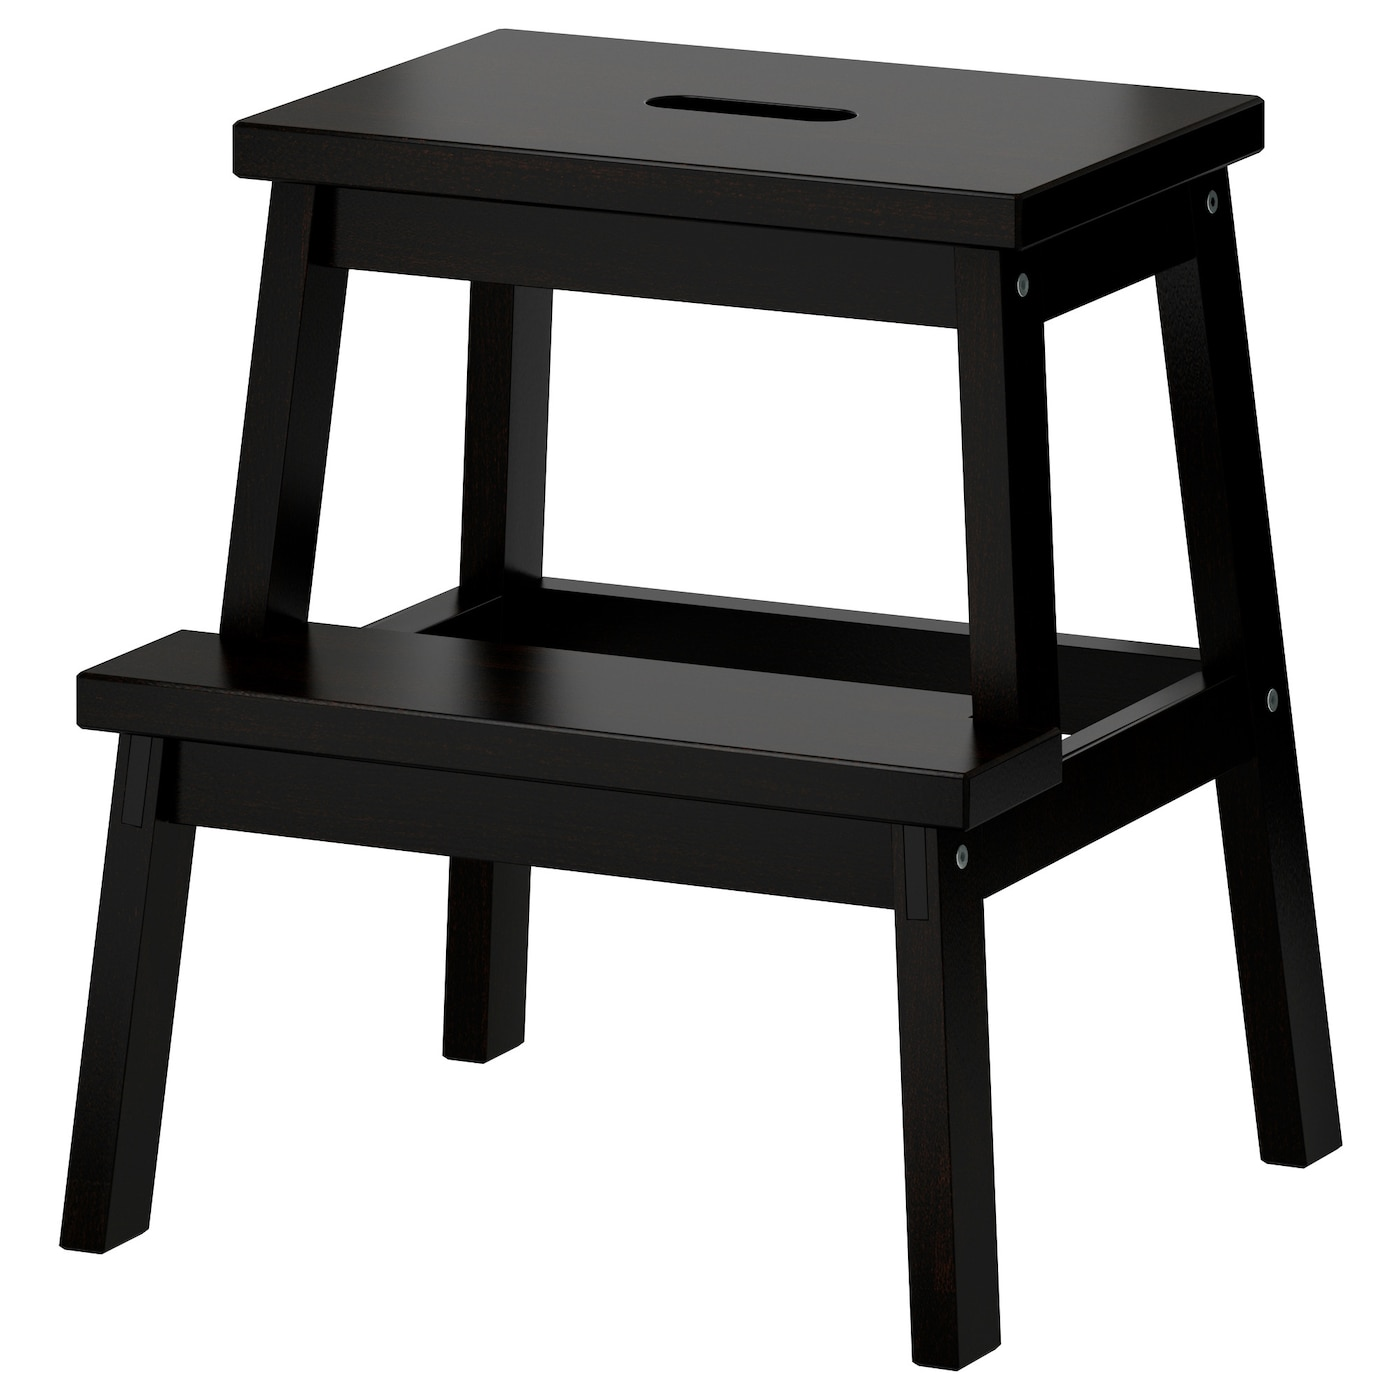 Bekv 196 M Opstapje Kruk Zwart 50 Cm Ikea